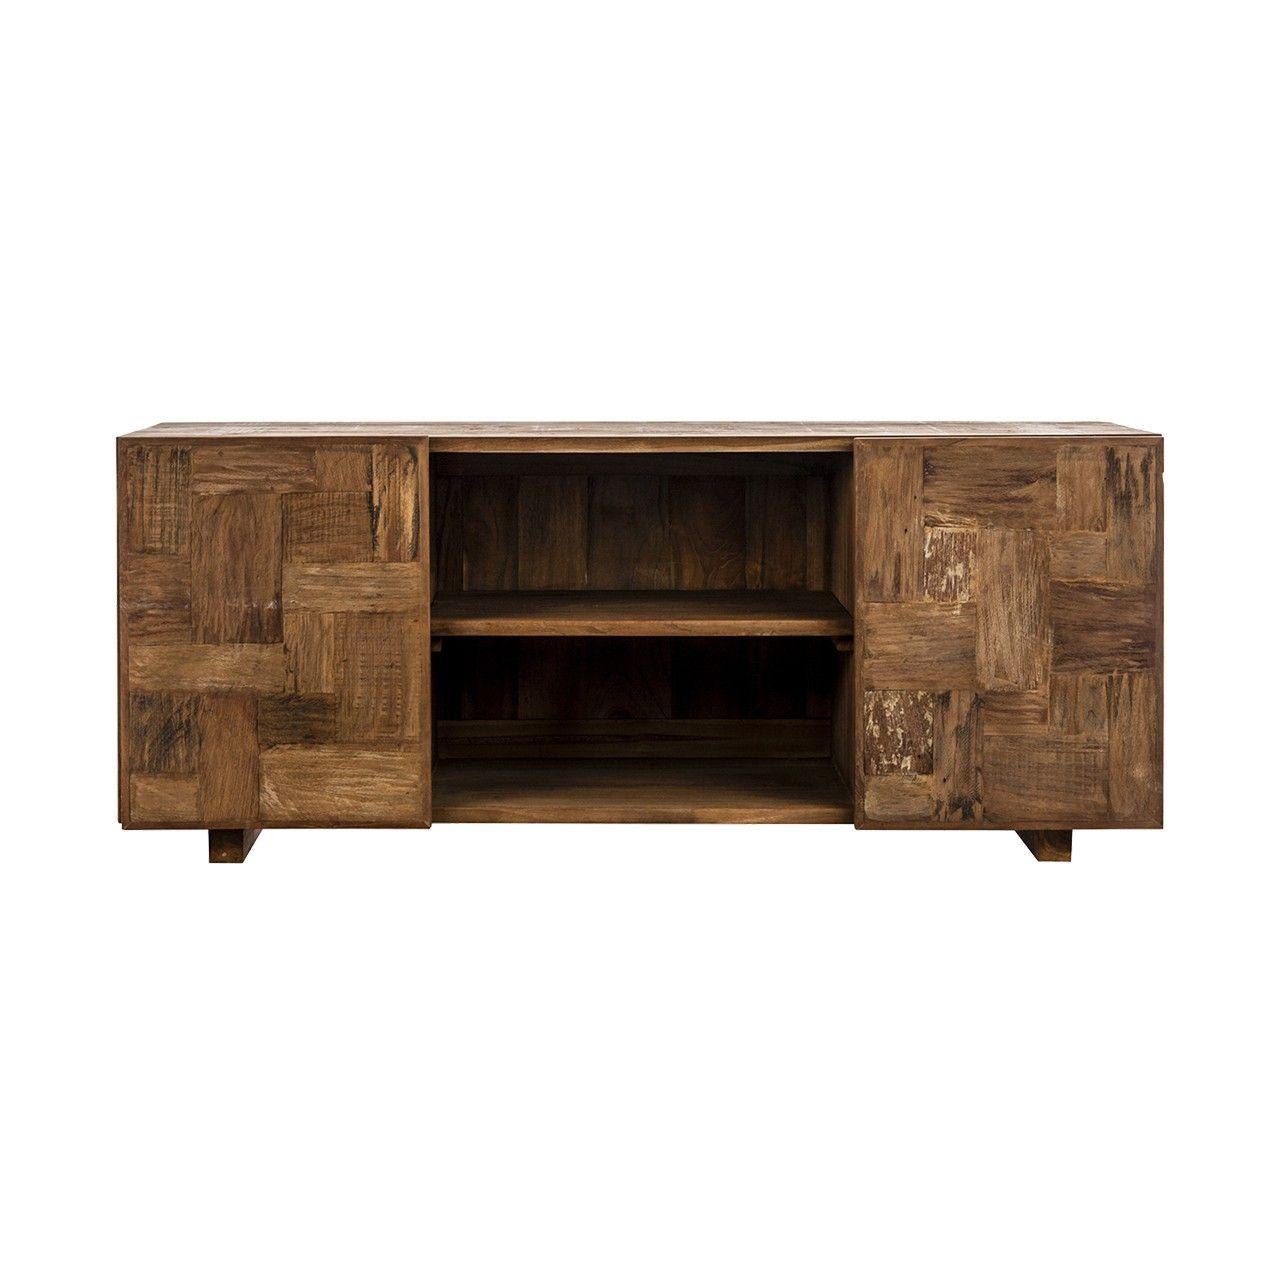 Mueble tv en #madera de teka #color #marrón | MUEBLES TV | Pinterest ...